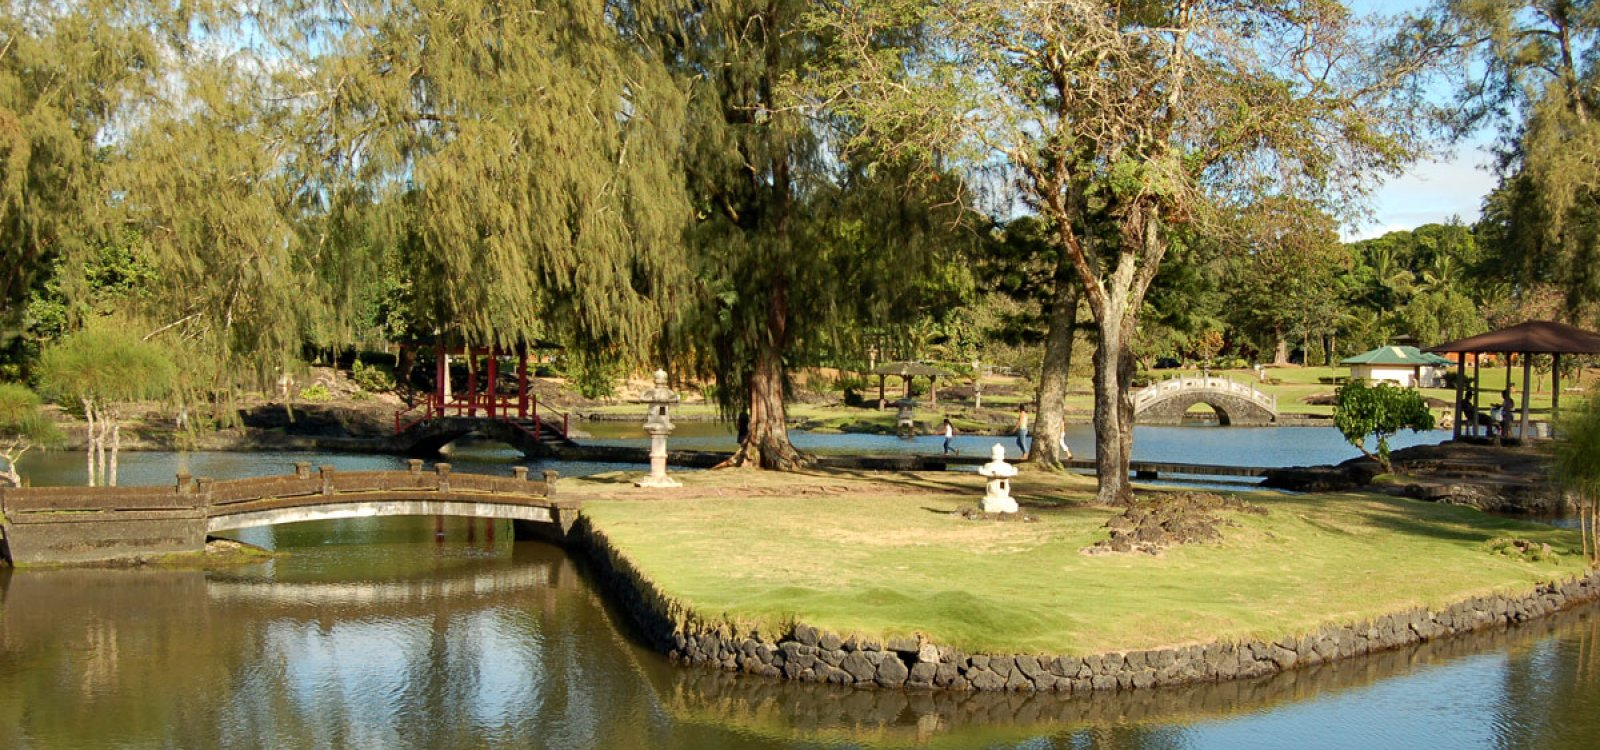 Liliuokalani Park and Gardens | Big Island Hawaii